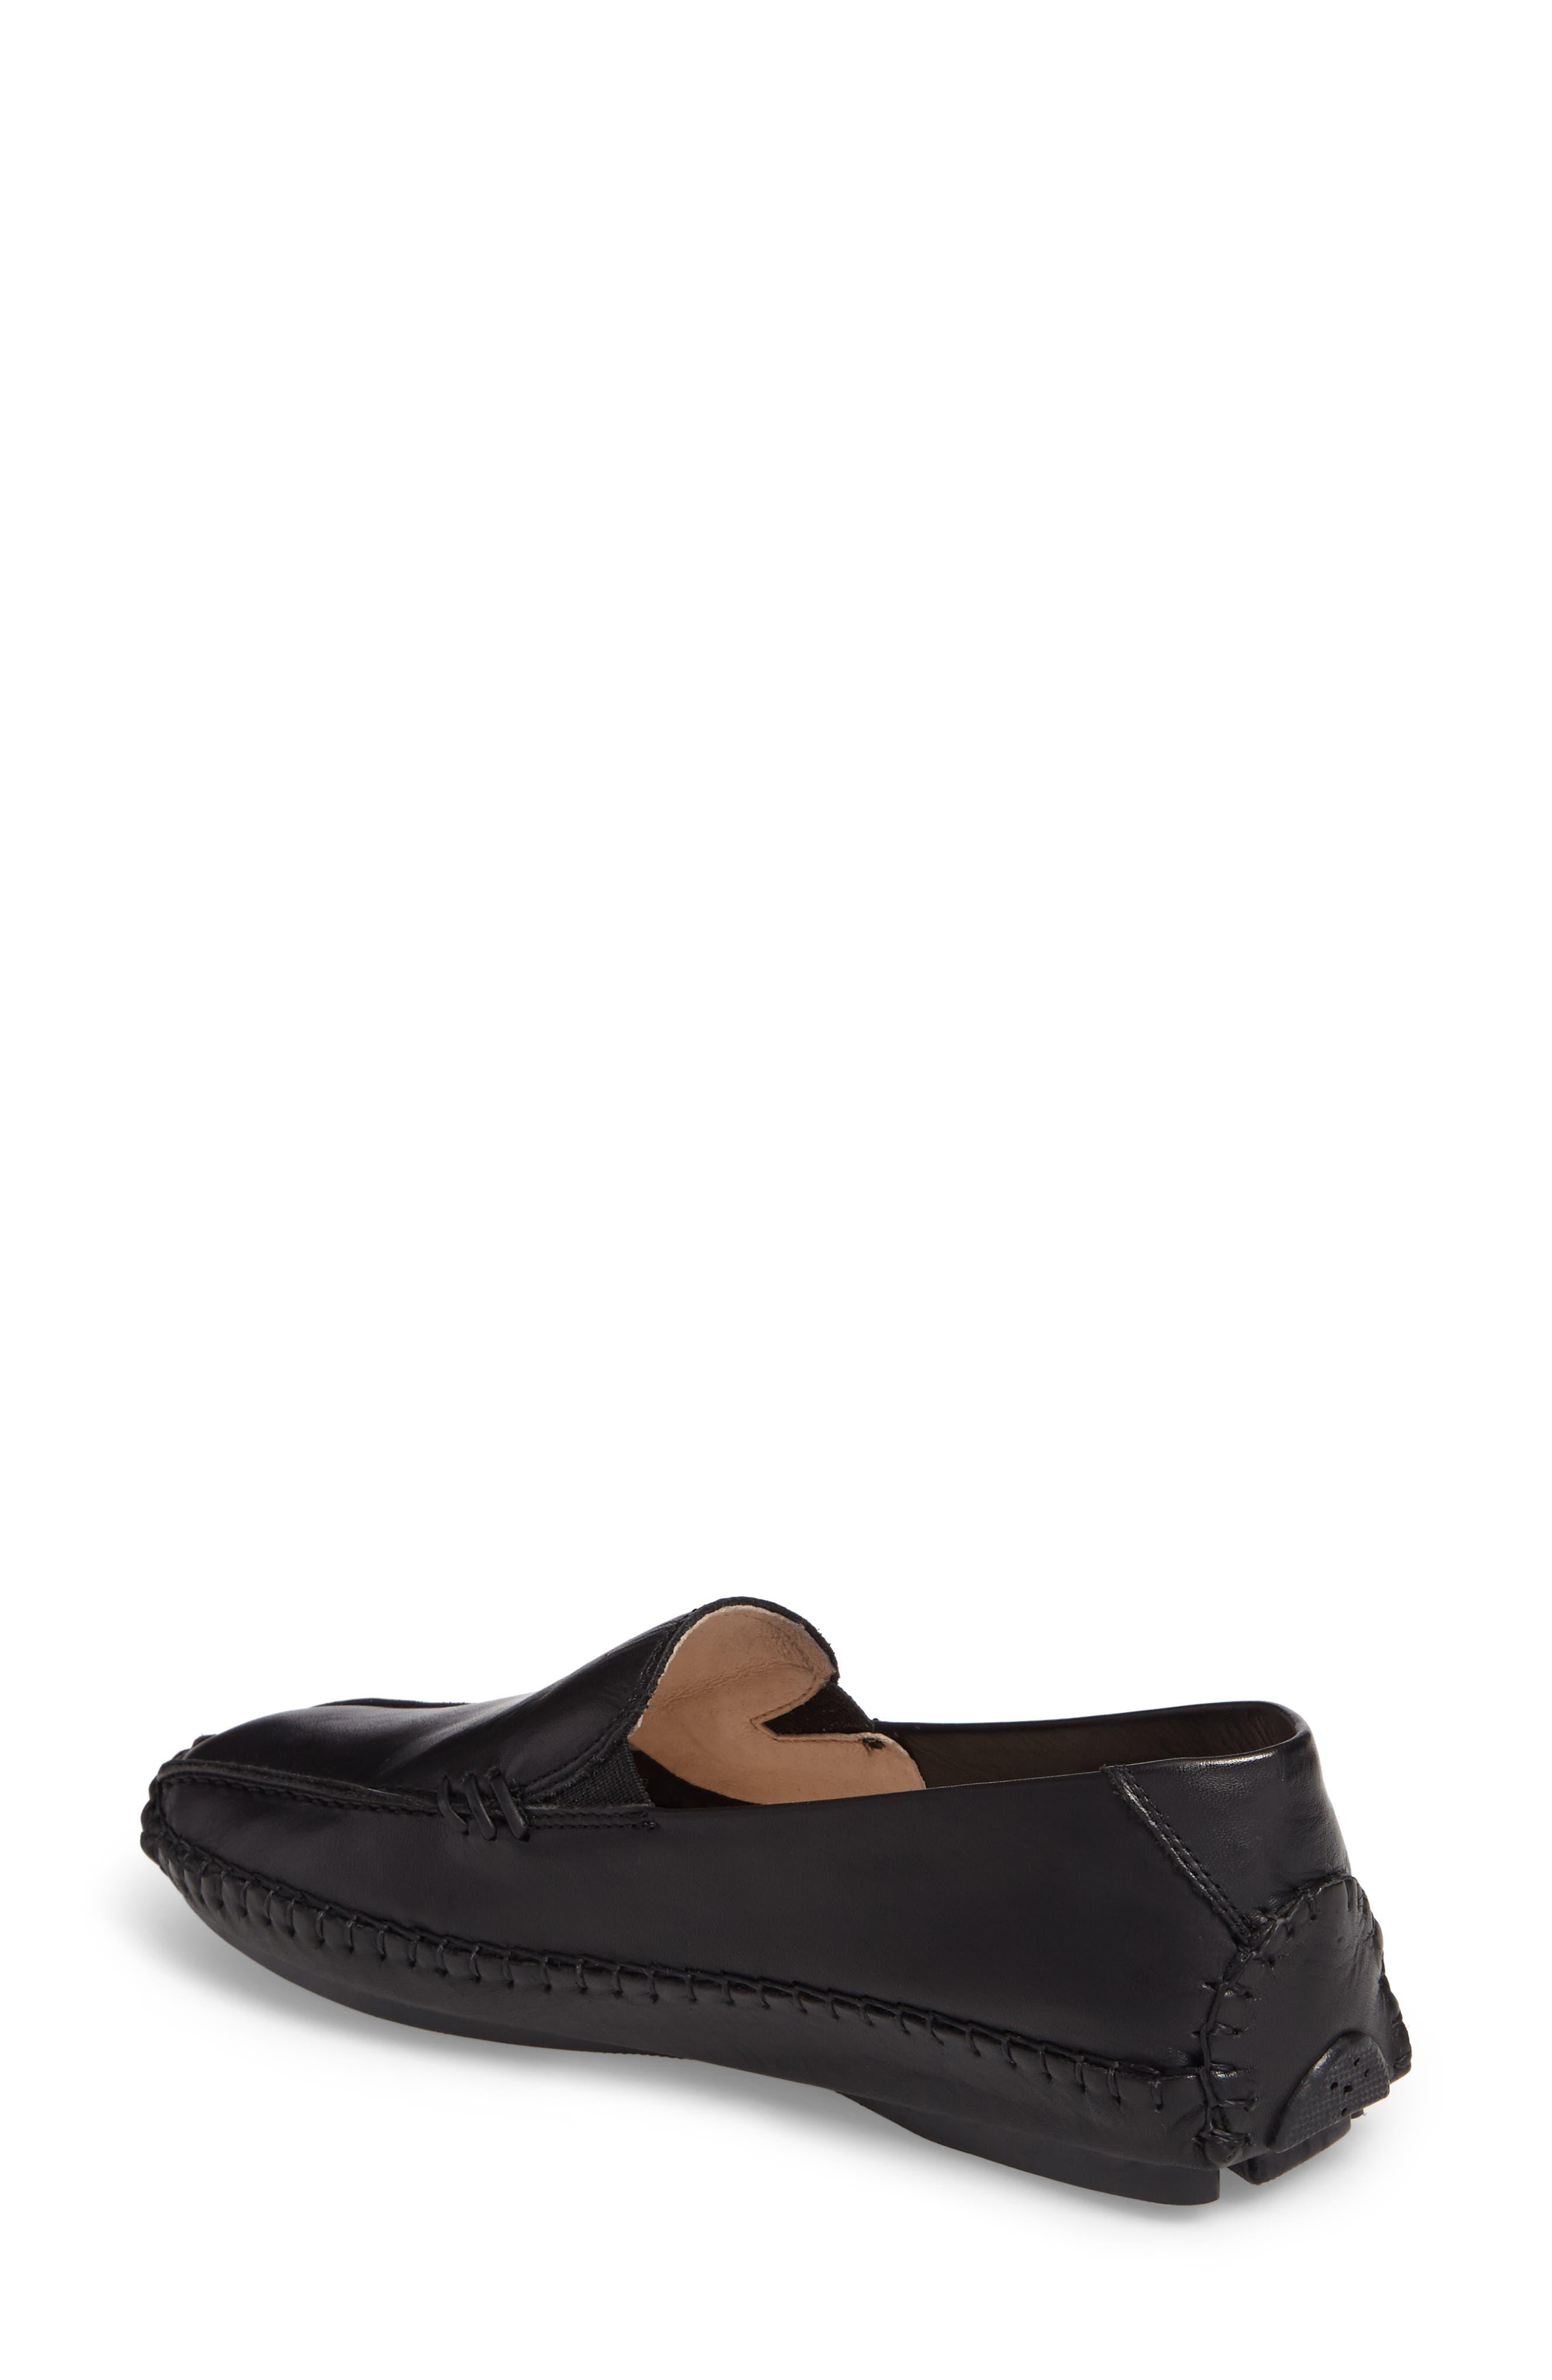 Jerez Loafer,                             Alternate thumbnail 2, color,                             BLACK LEATHER